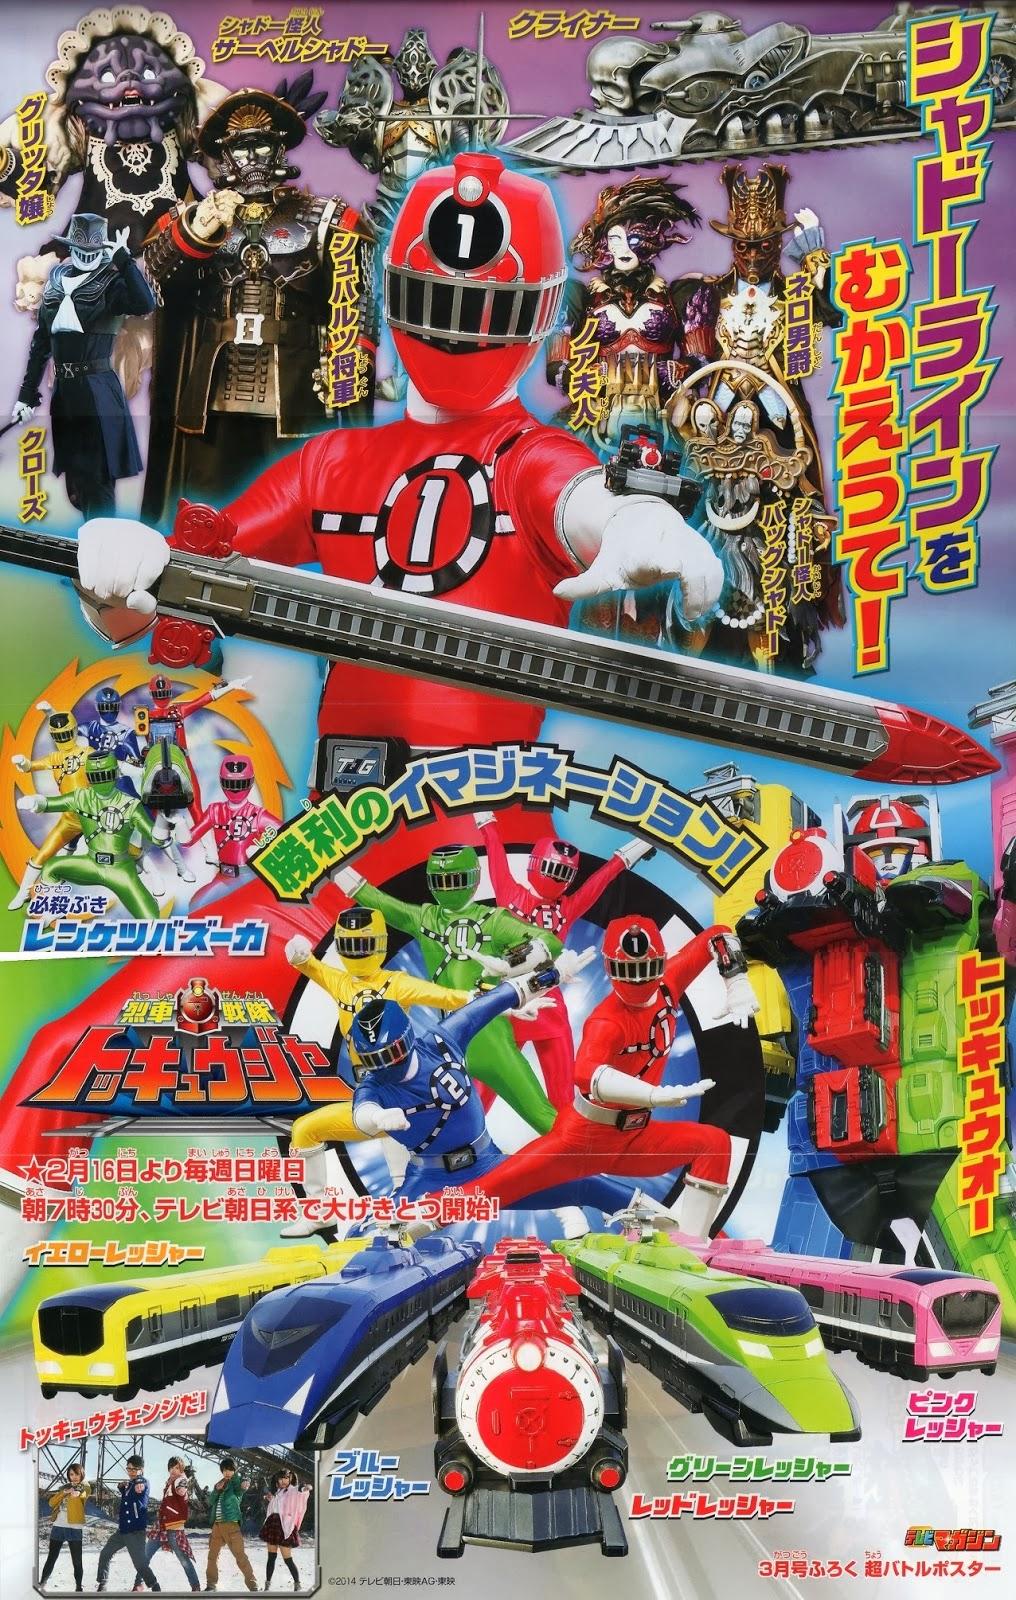 Ressha Sentai Toqger Vs Kamen Rider Gaim